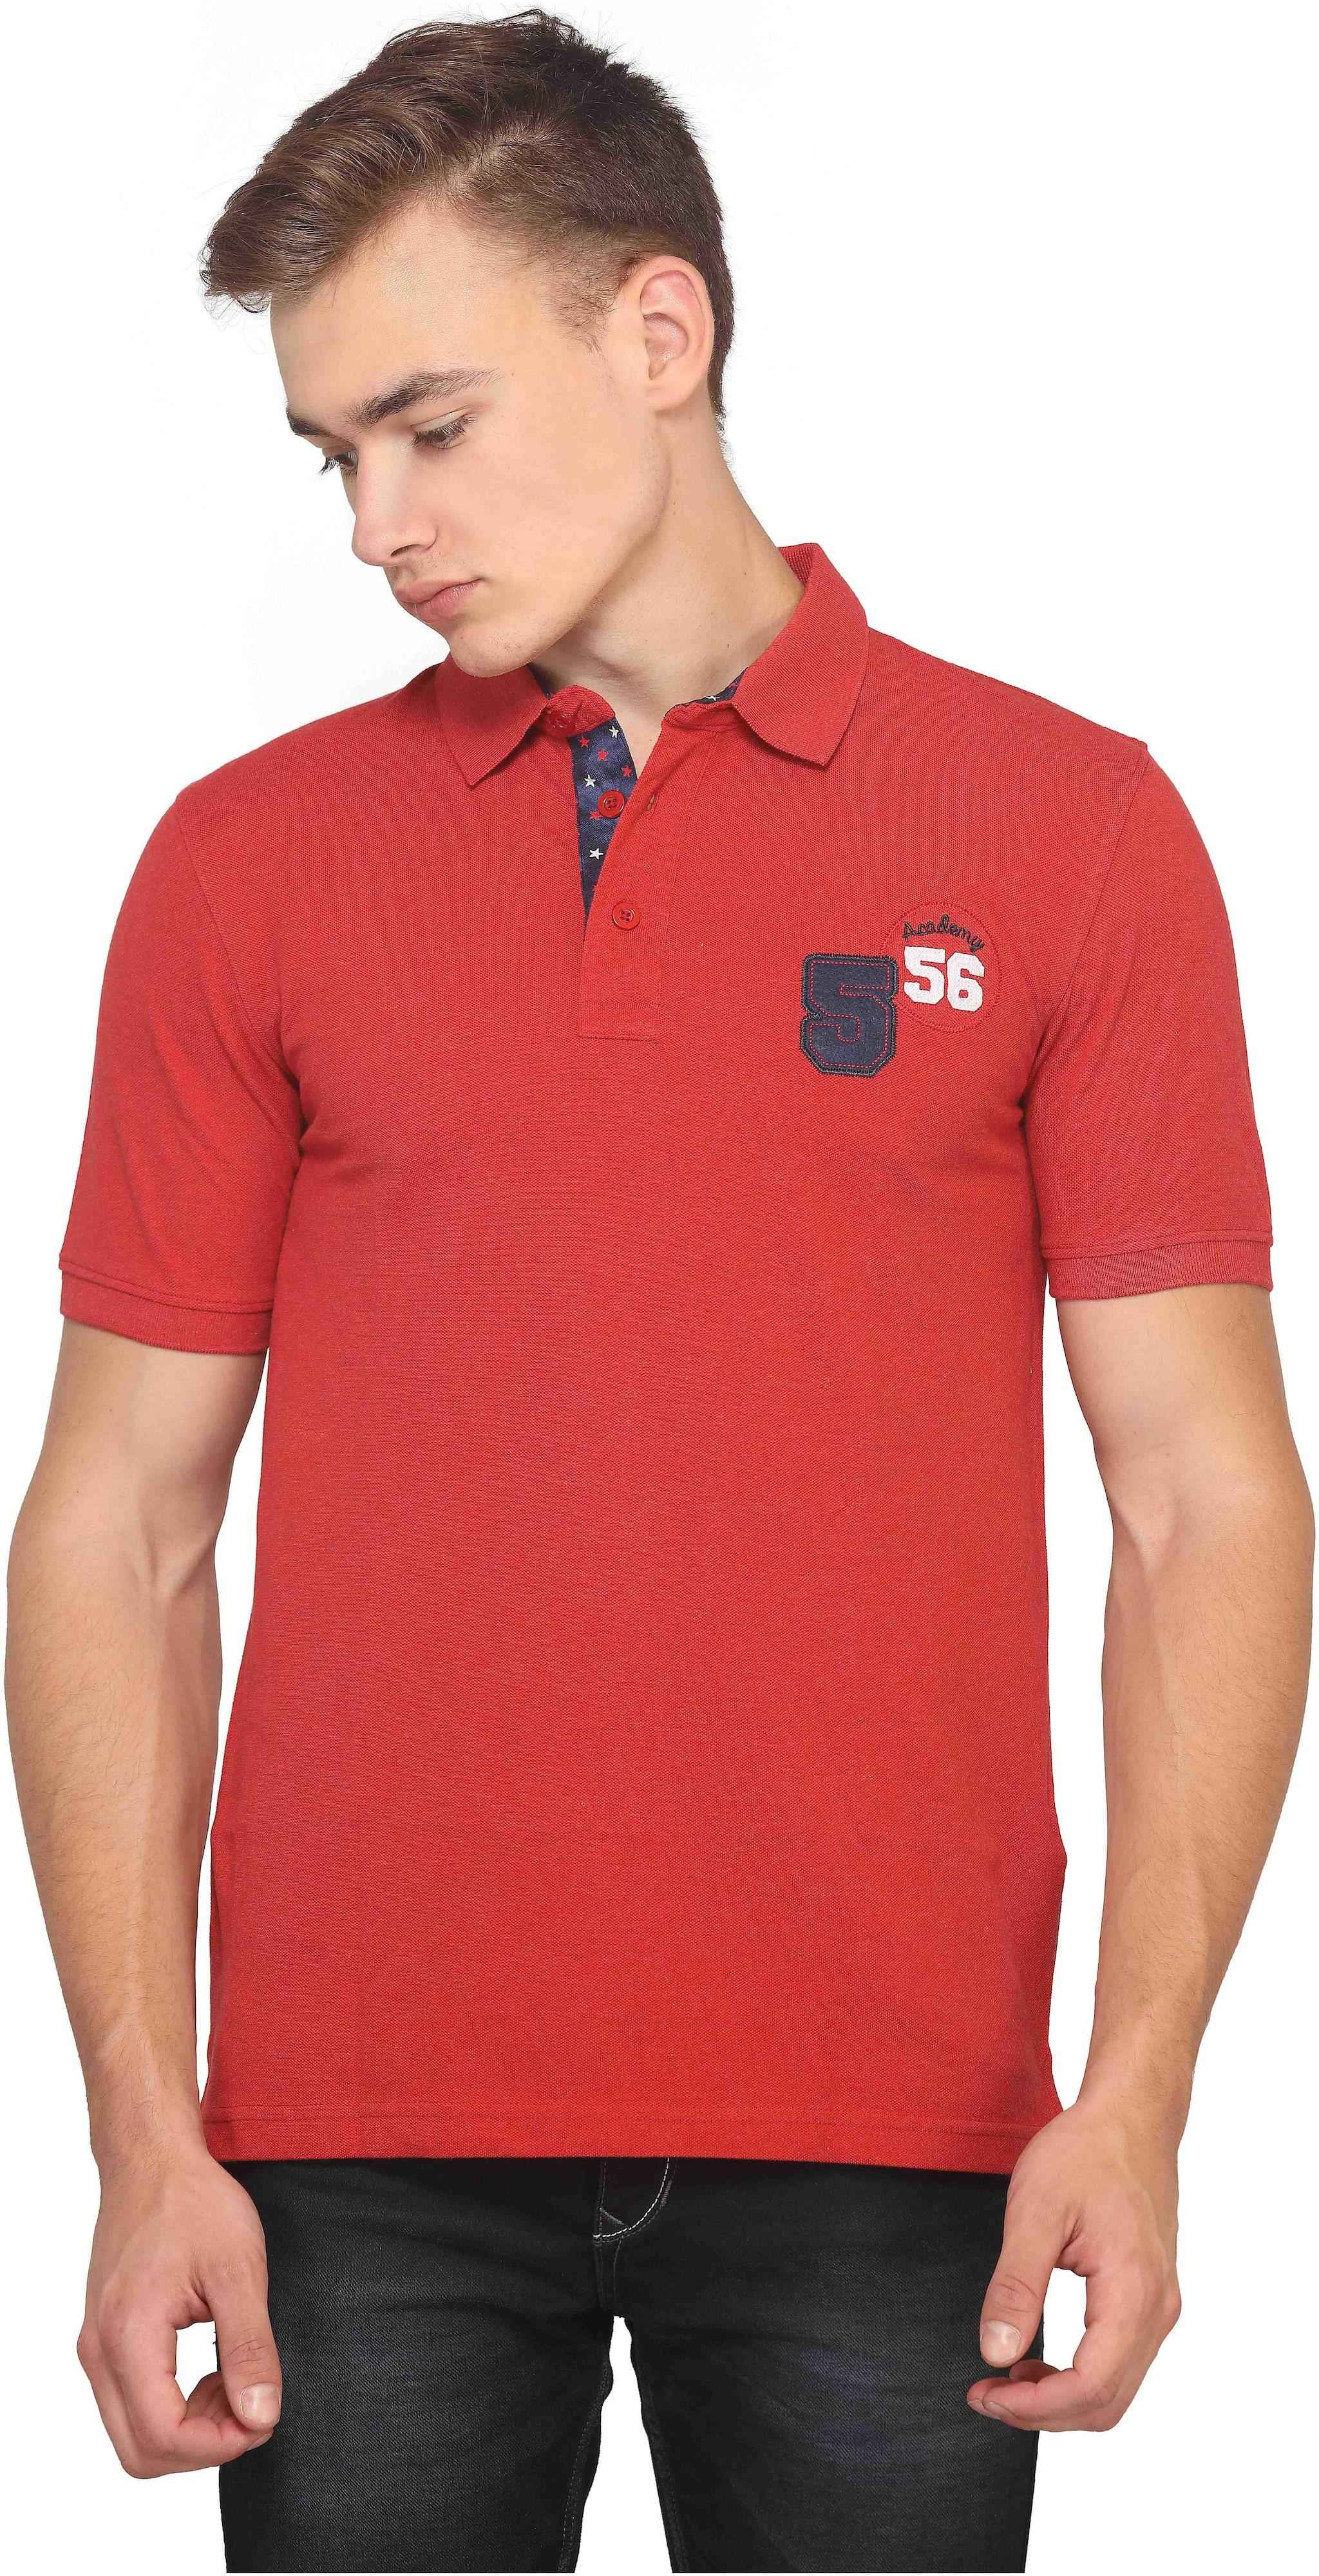 94e5ca60794f https://assetscdn1.paytm.com/images/catalog/product/. Mr.Stag Plain Men's  Collar Neck Red Half Sleeves ...